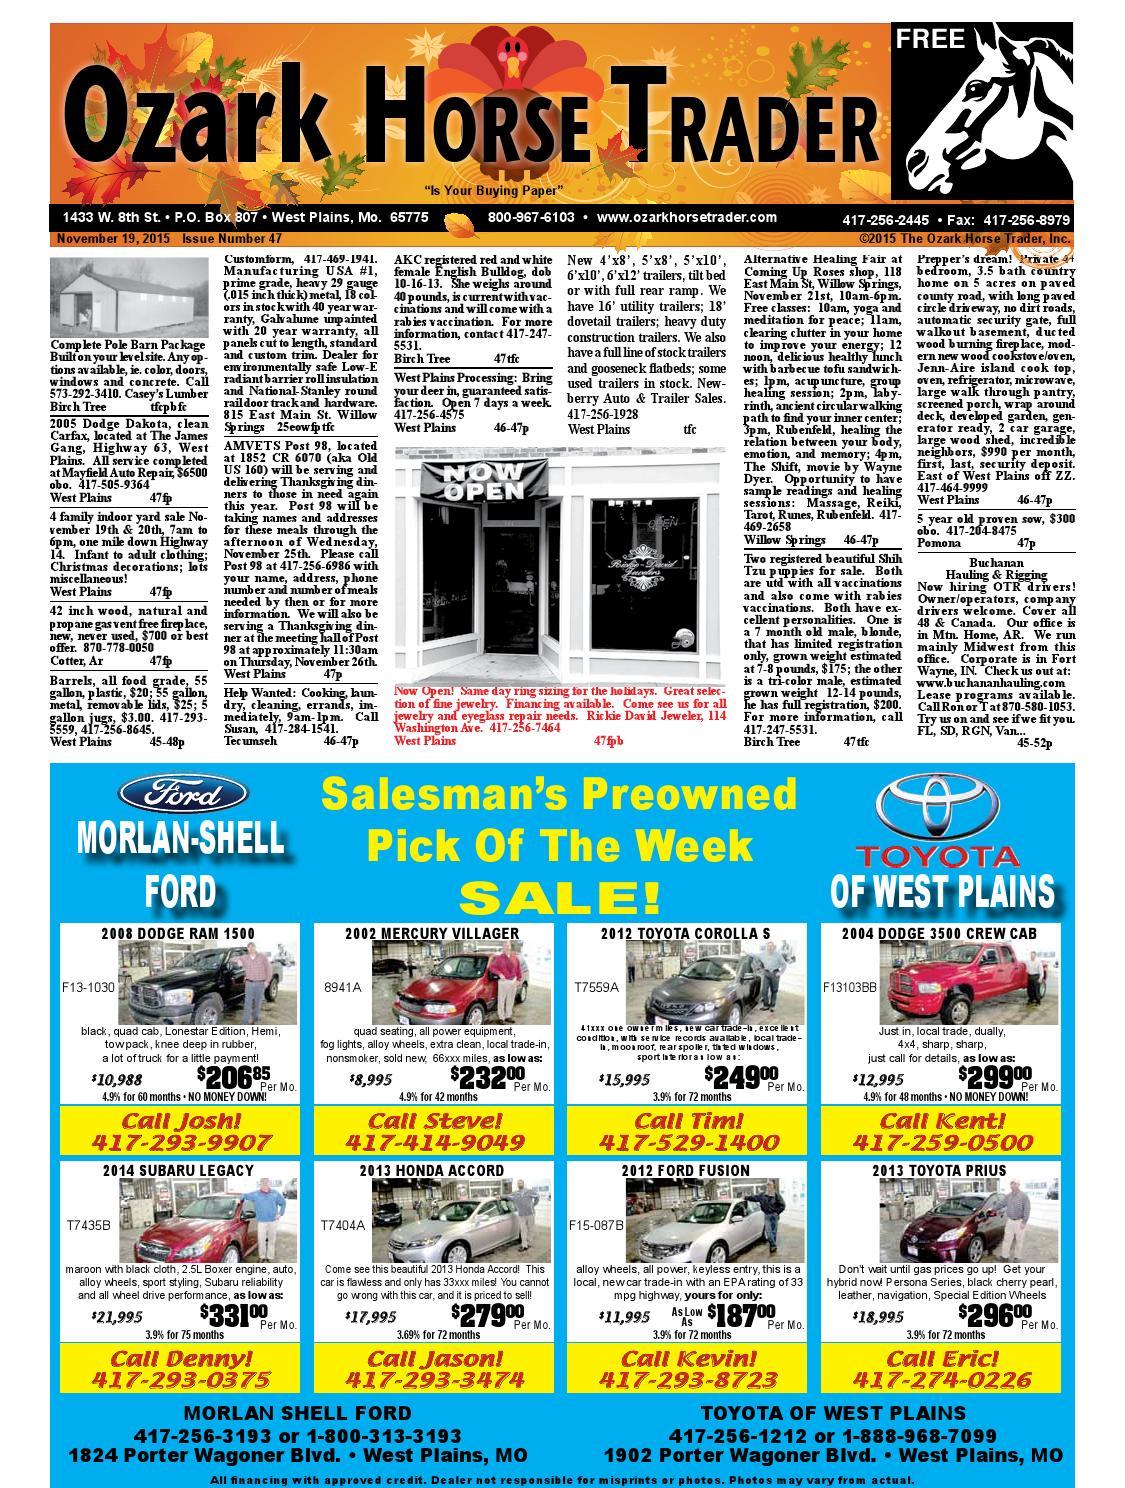 Issue47 By Ozark Horse Trader Issuu Chopper Wiring Diagram Besides Maytag Atlantis Dryer